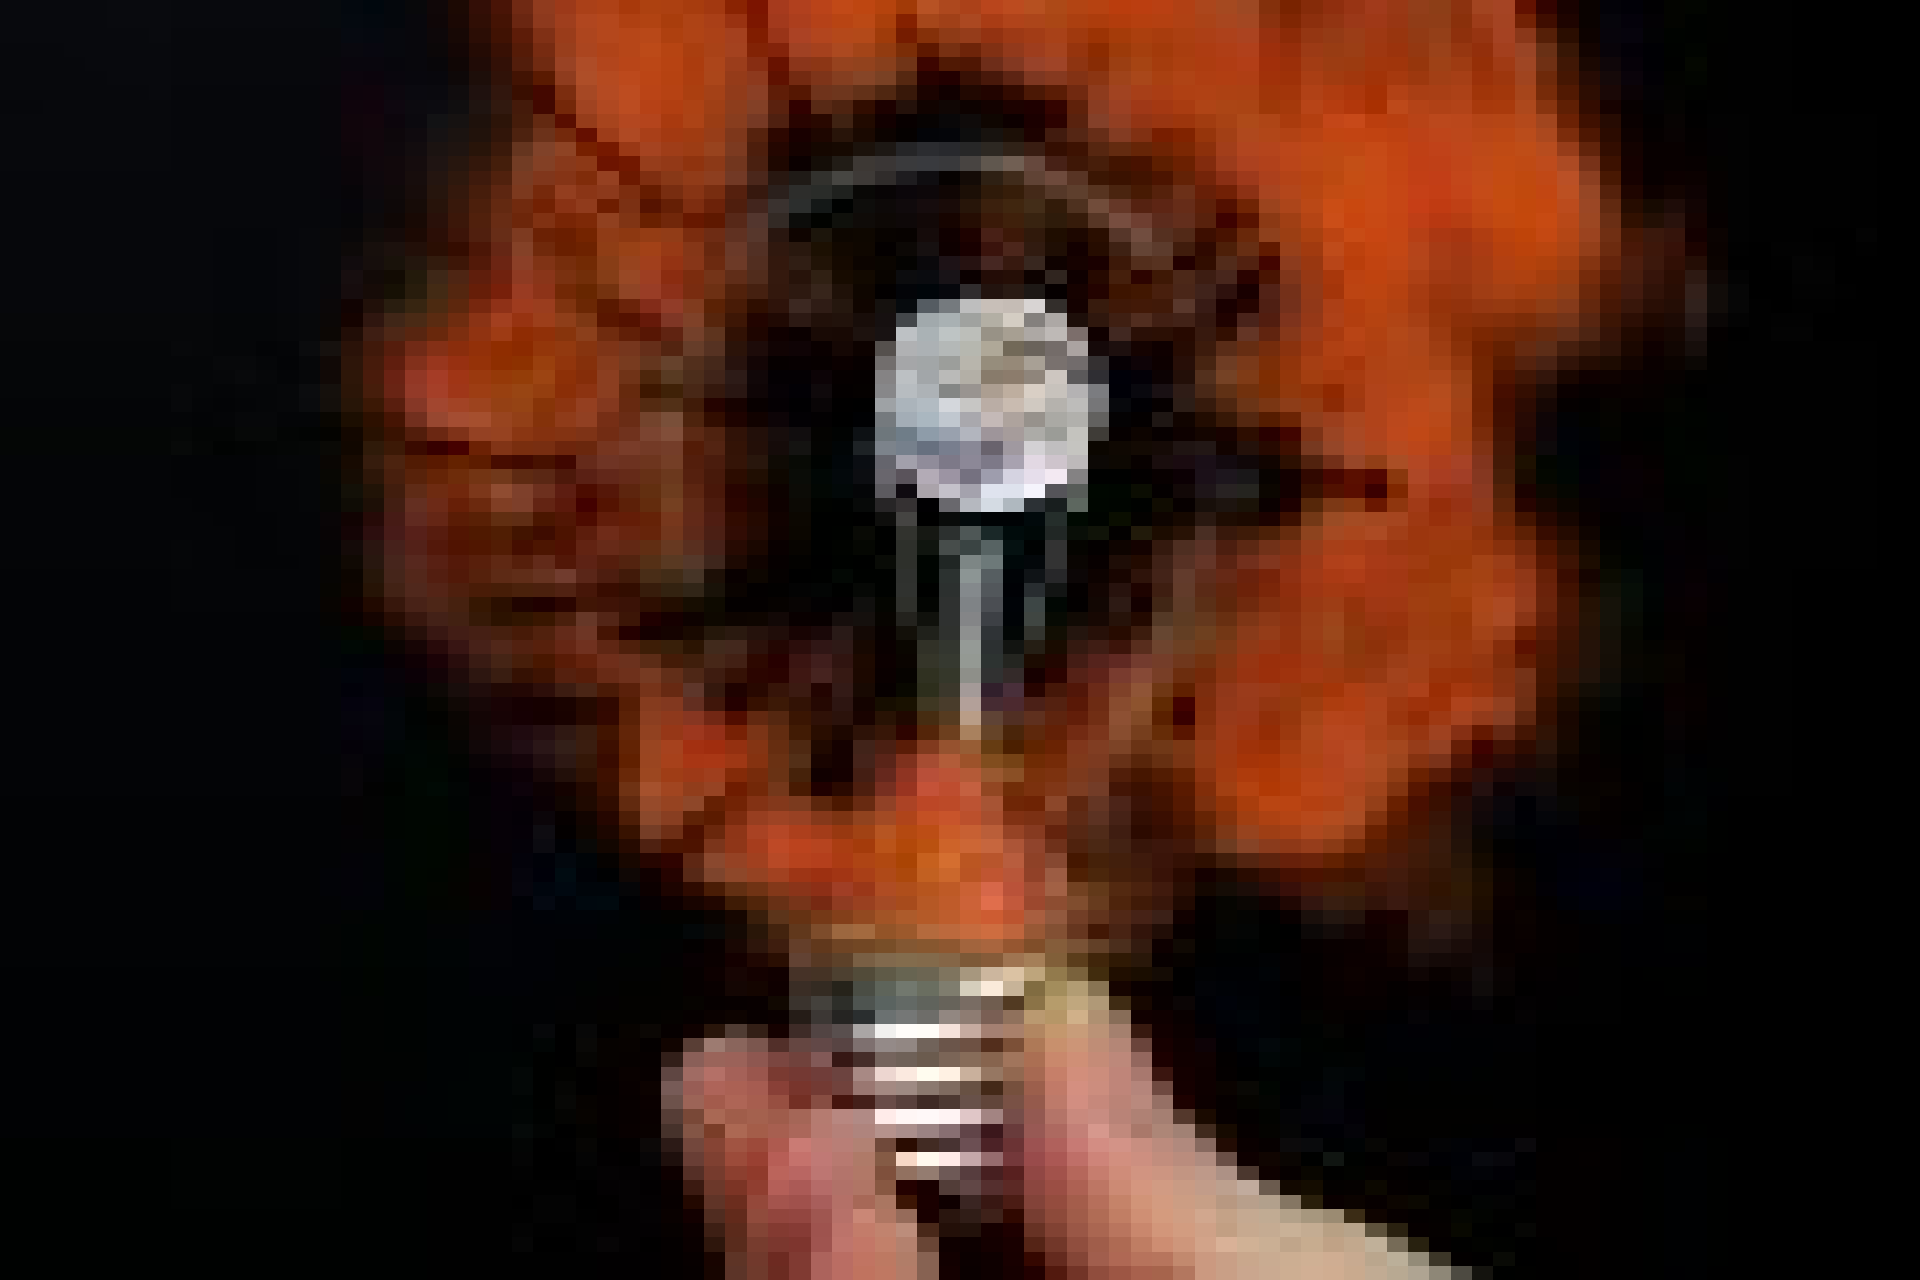 Calentamiento global - Calentamiento global ¿podemos frenarlo?